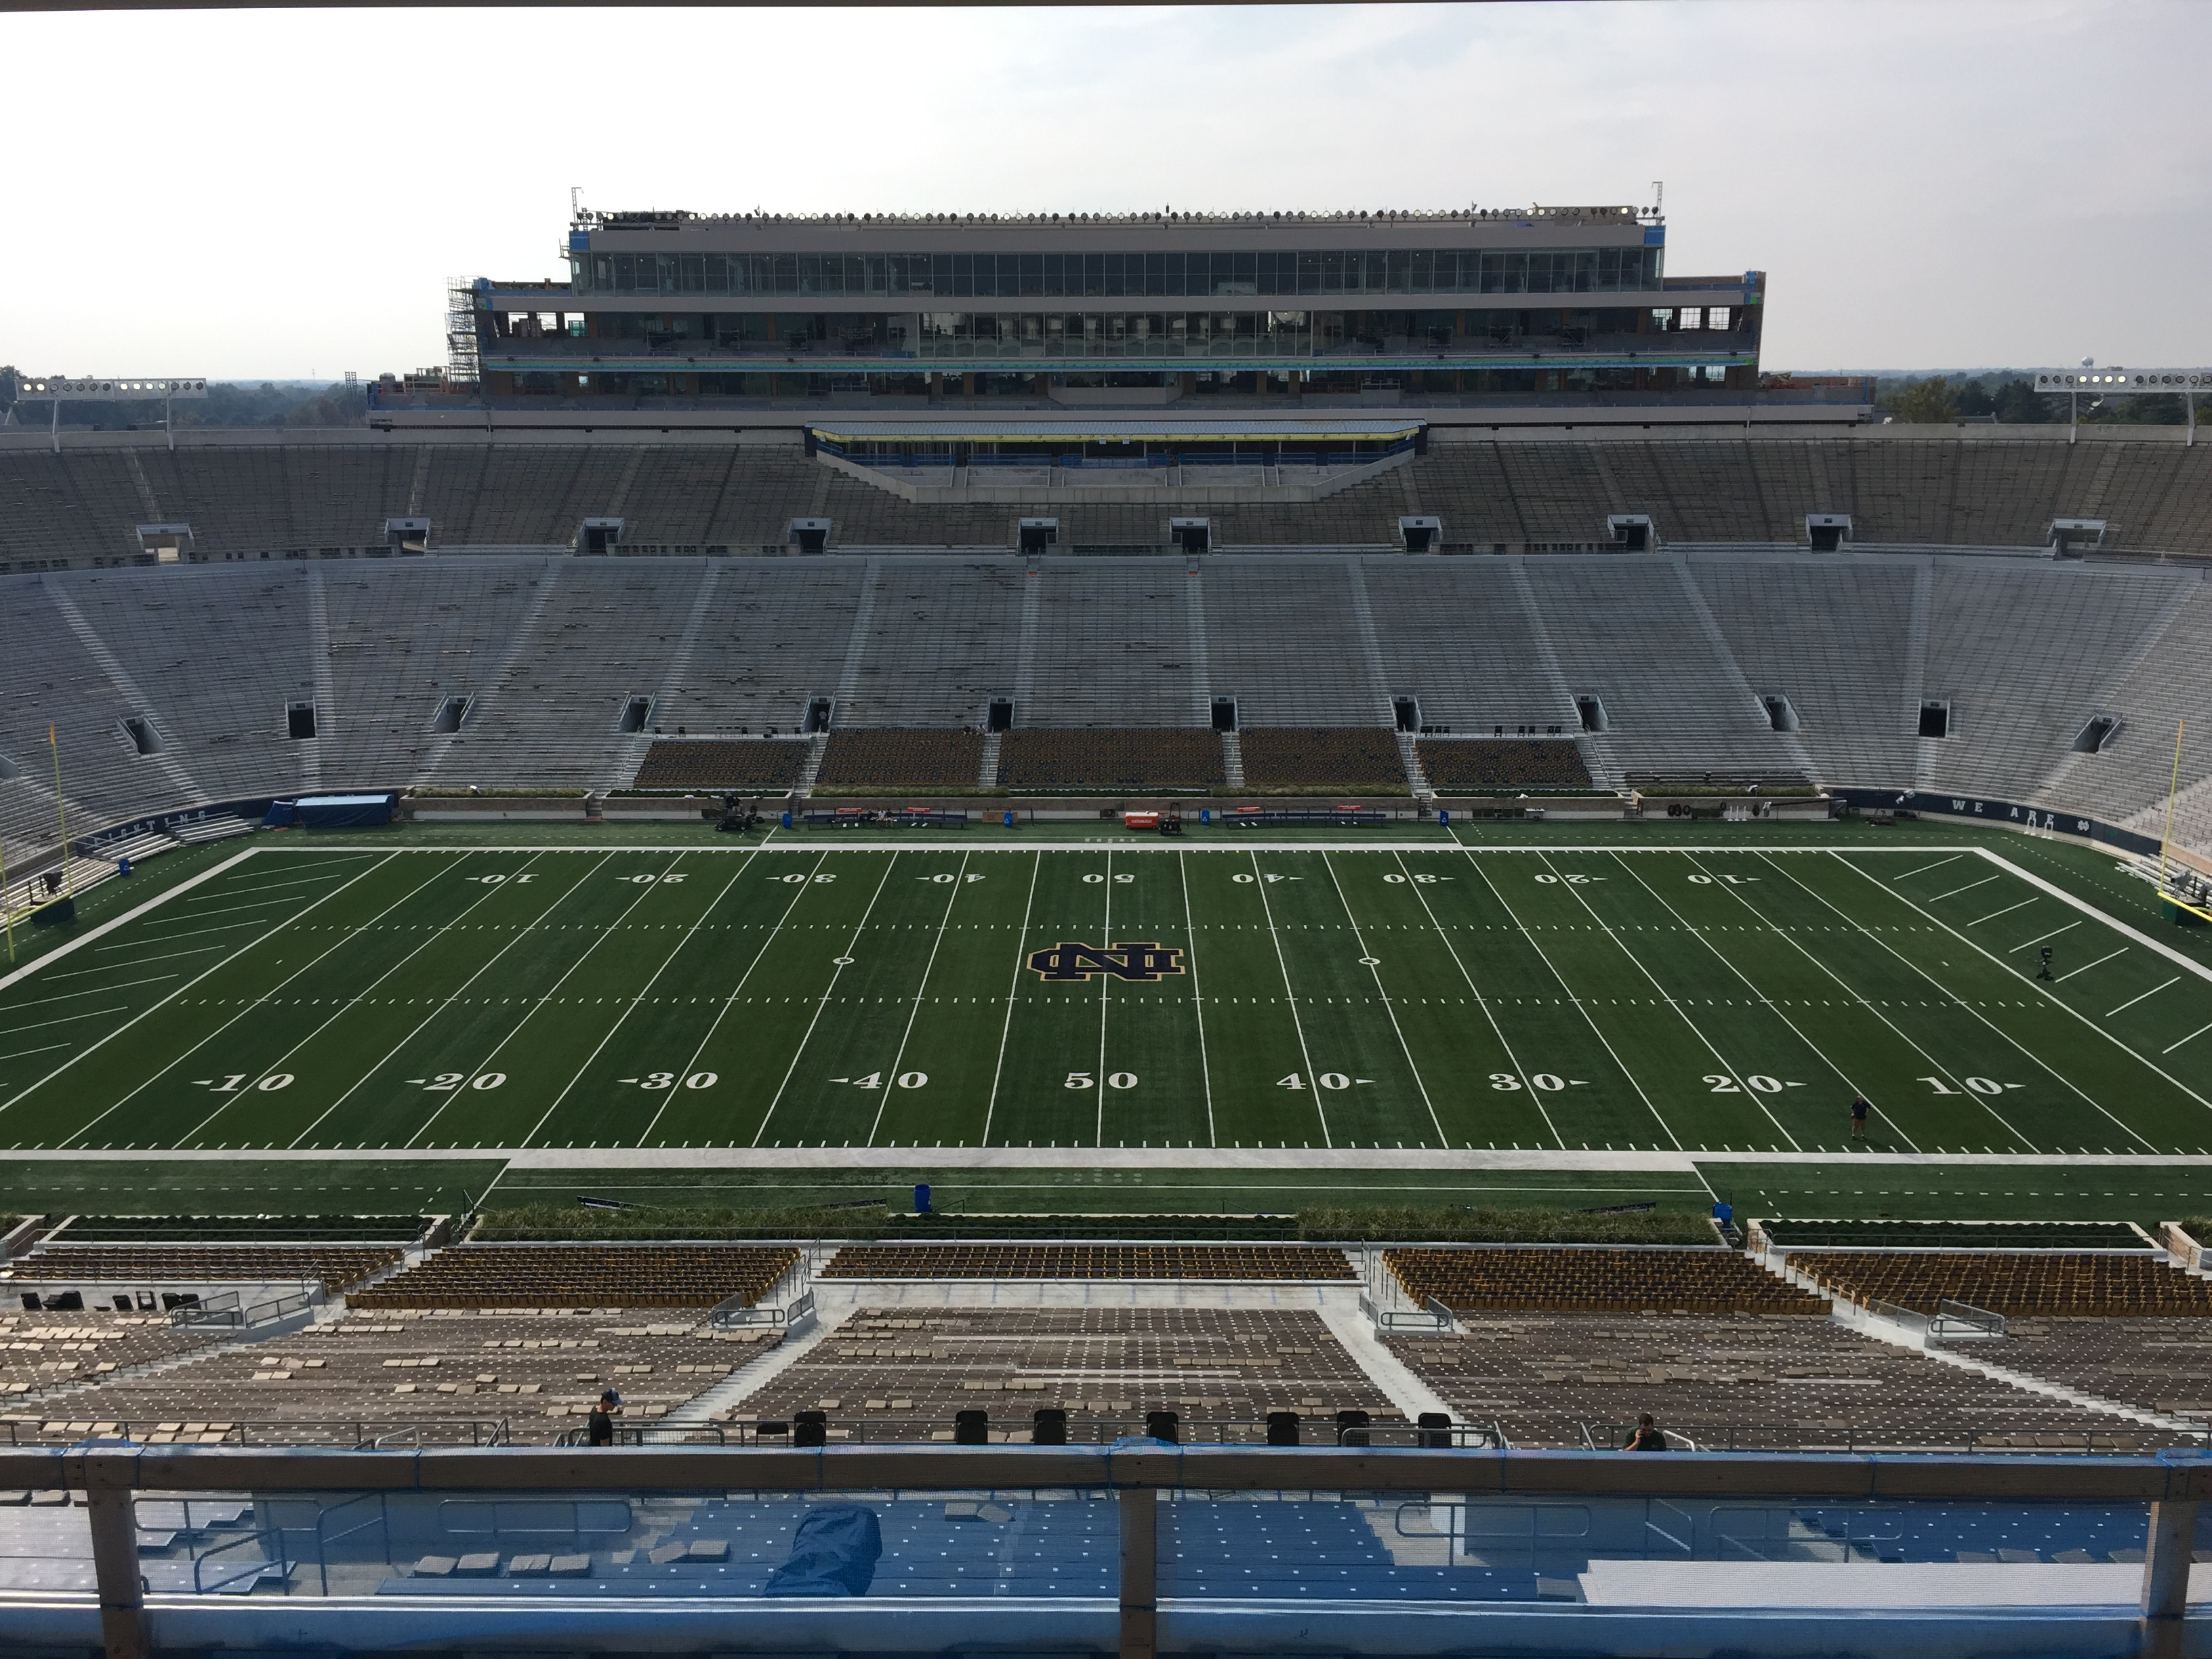 File:University of Notre Dame Stadium.jpg - Wikimedia Commons